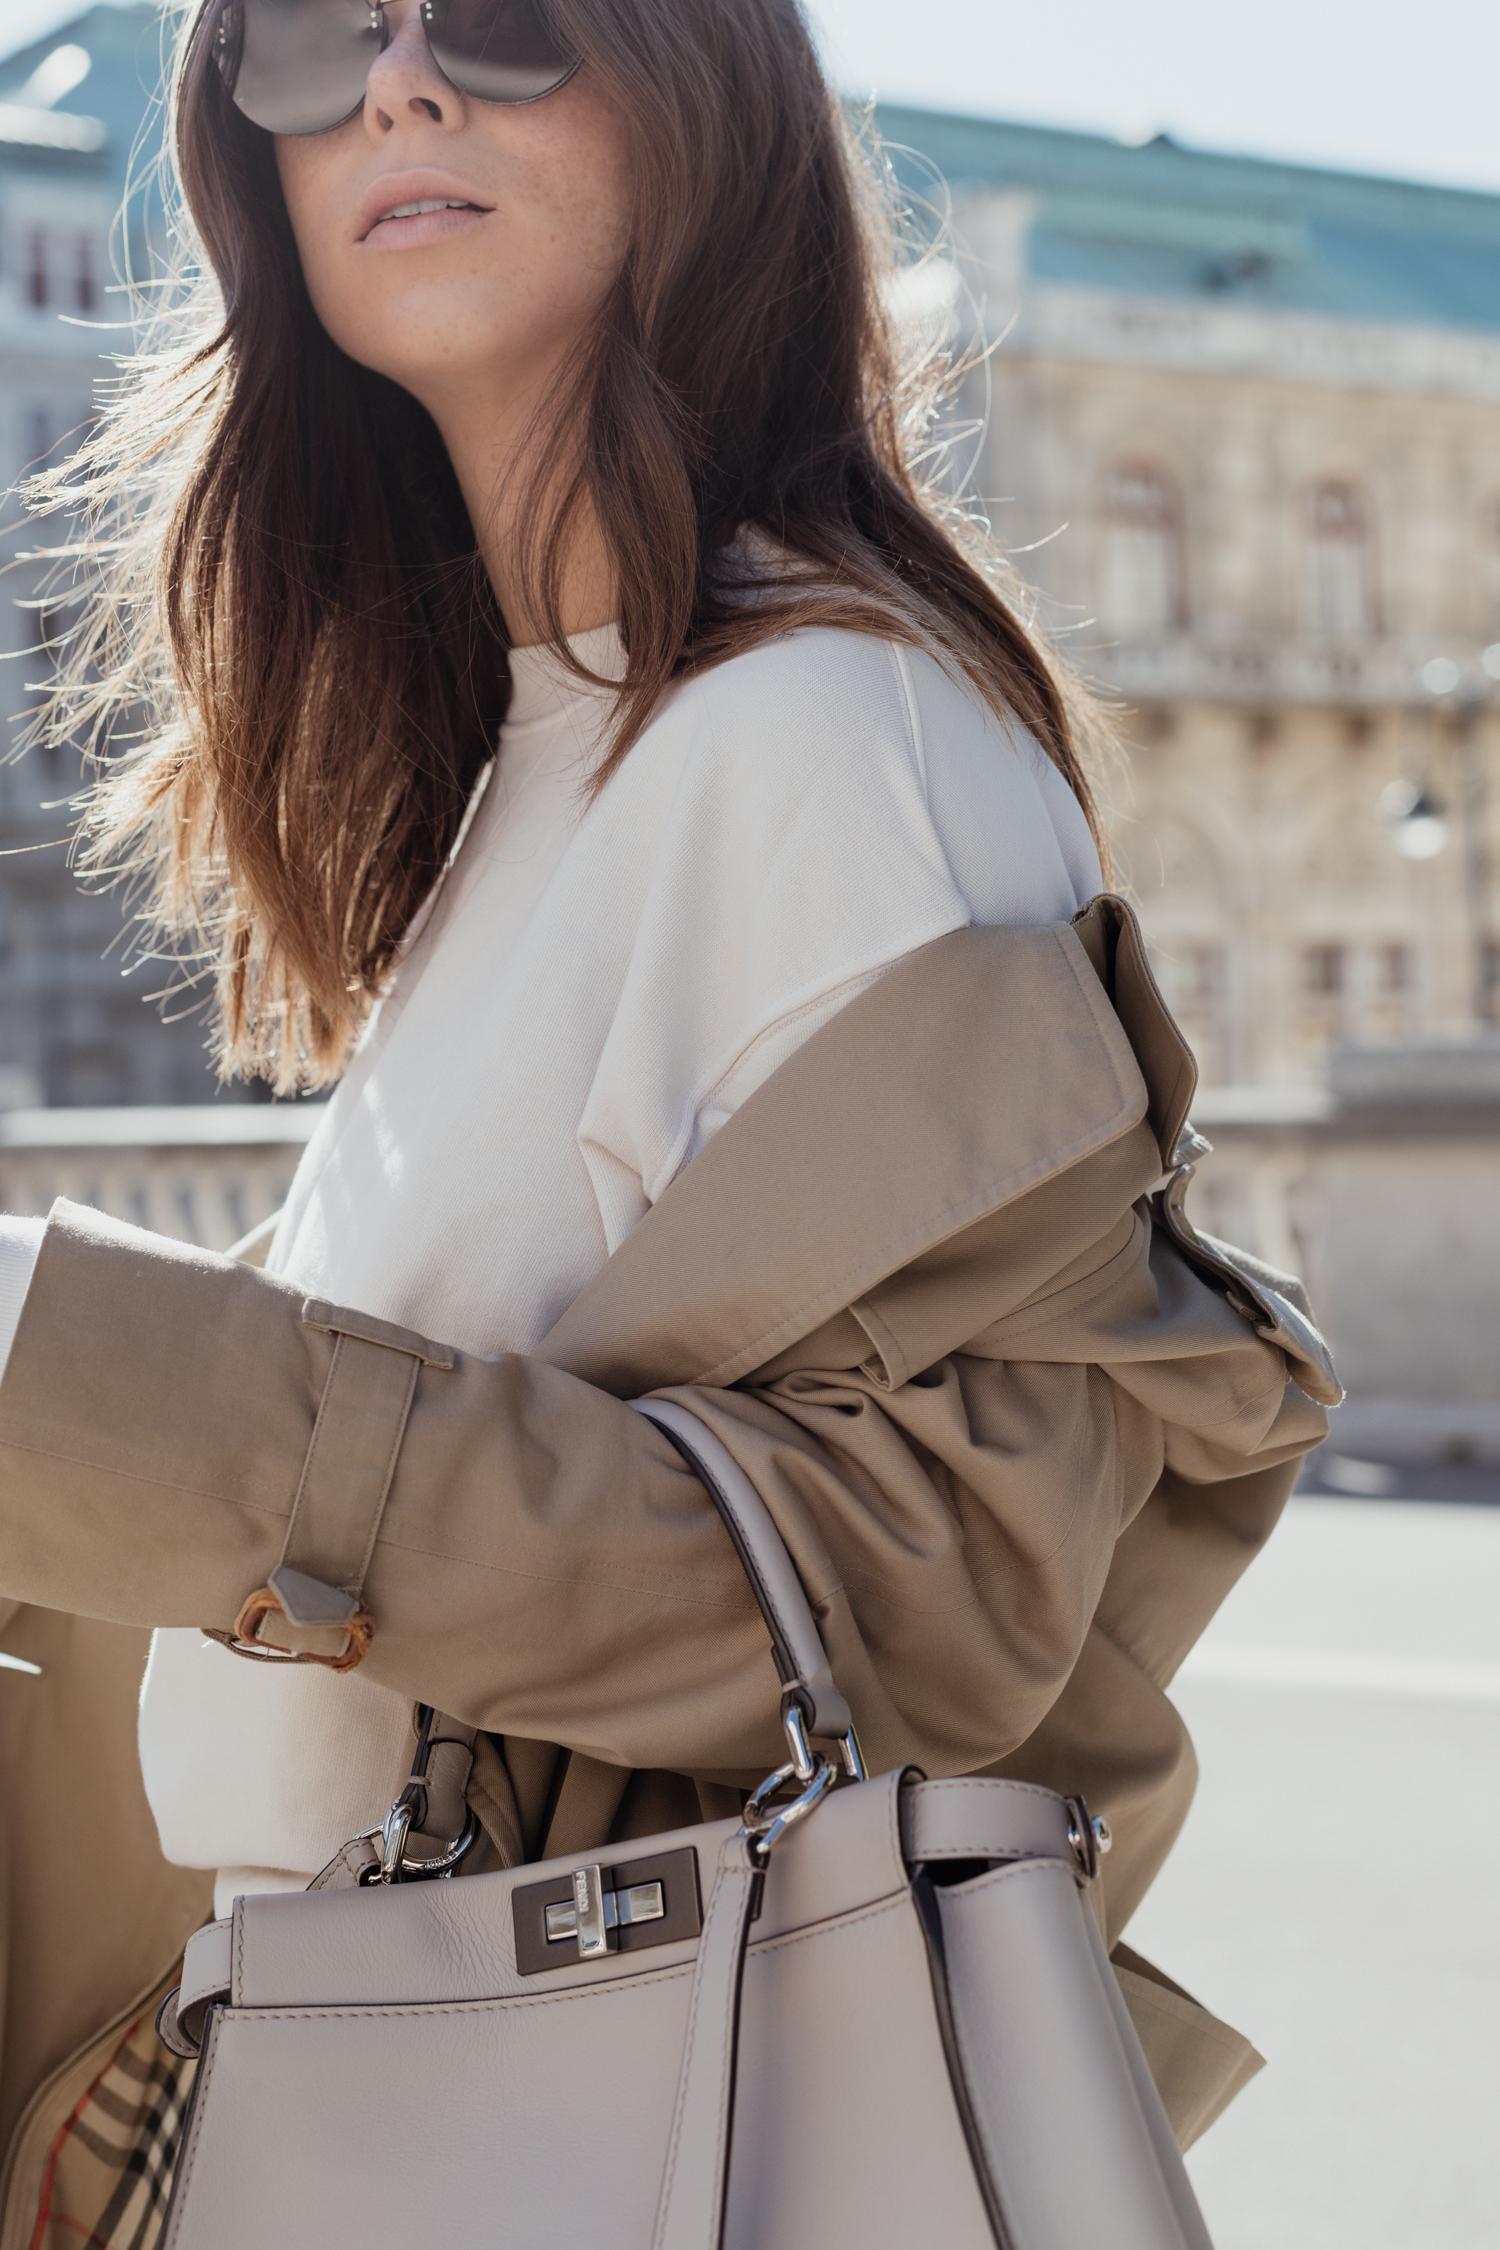 Ebay Fashion: The Fall Fashion Fix | Bikinis & Passports